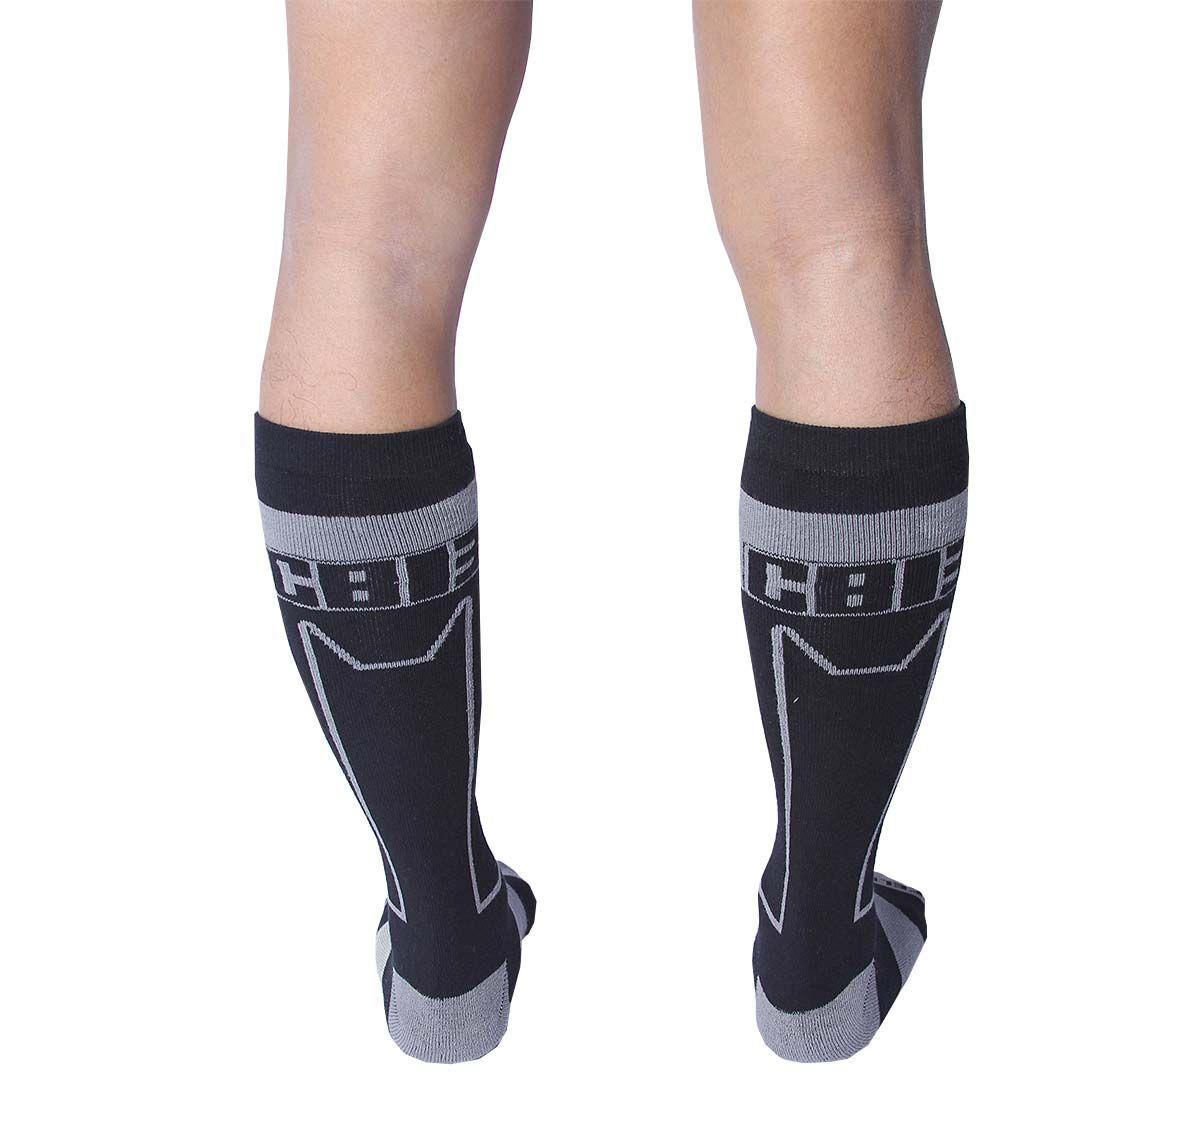 Cellblock 13 Sports socks KENNEL CLUB ALPHA KNEE HIGH SOCK, grey